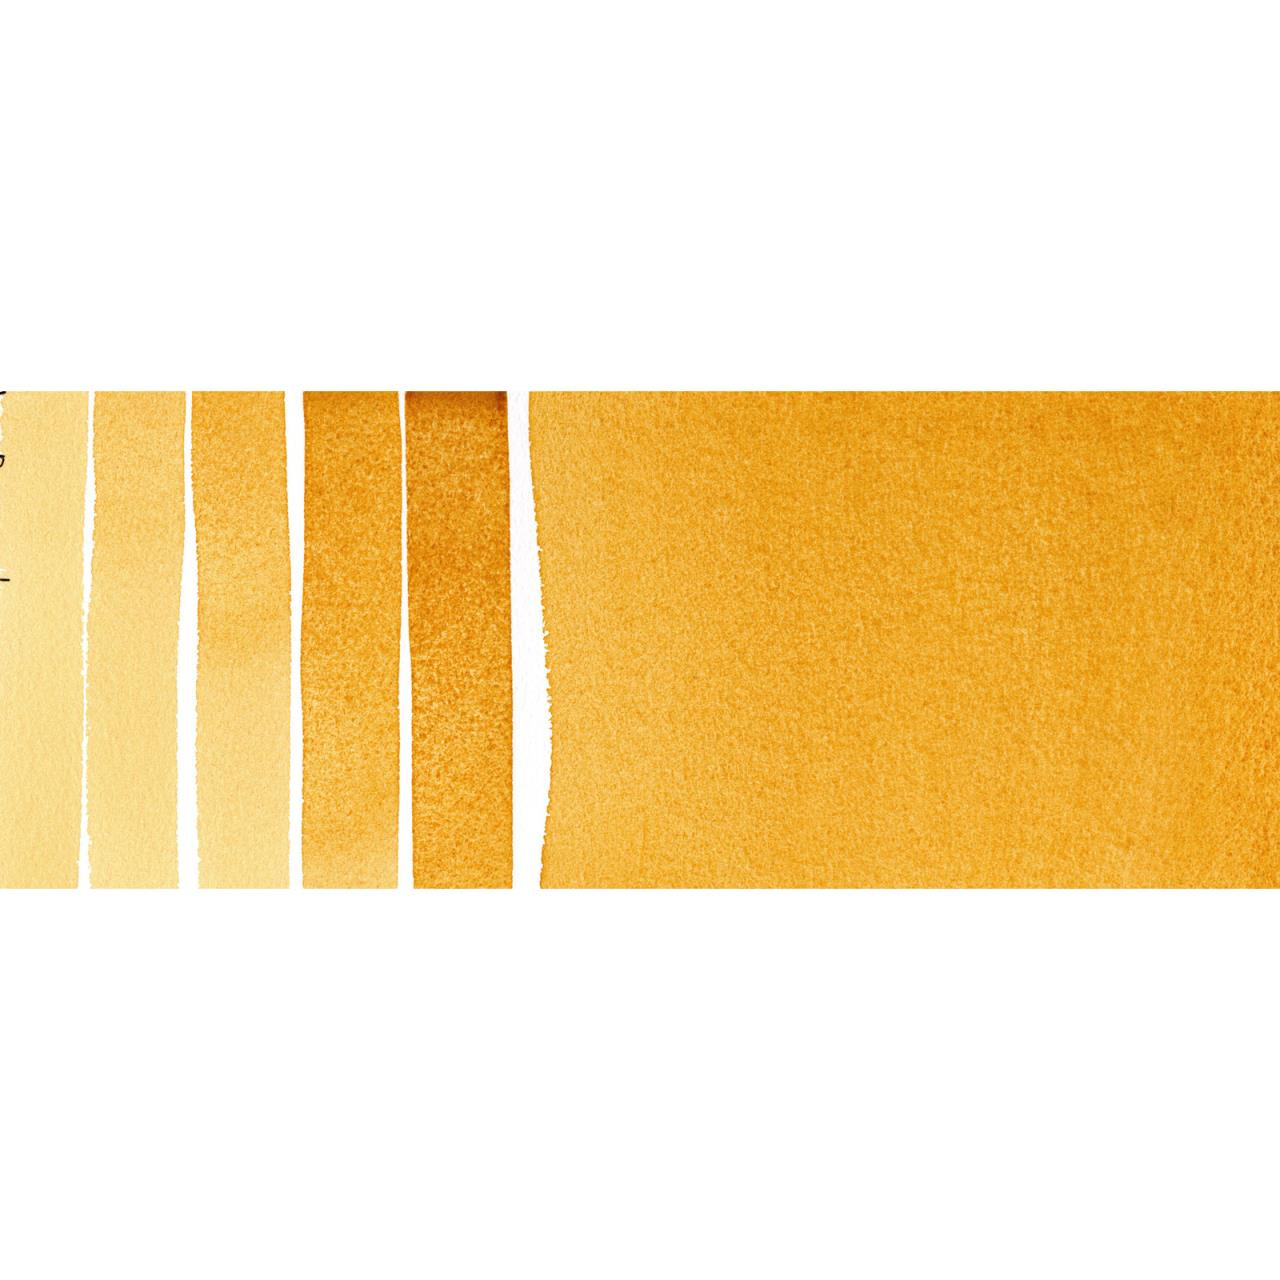 Yellow Ochre, DANIEL SMITH Extra Fine Watercolors 5ml Tubes -